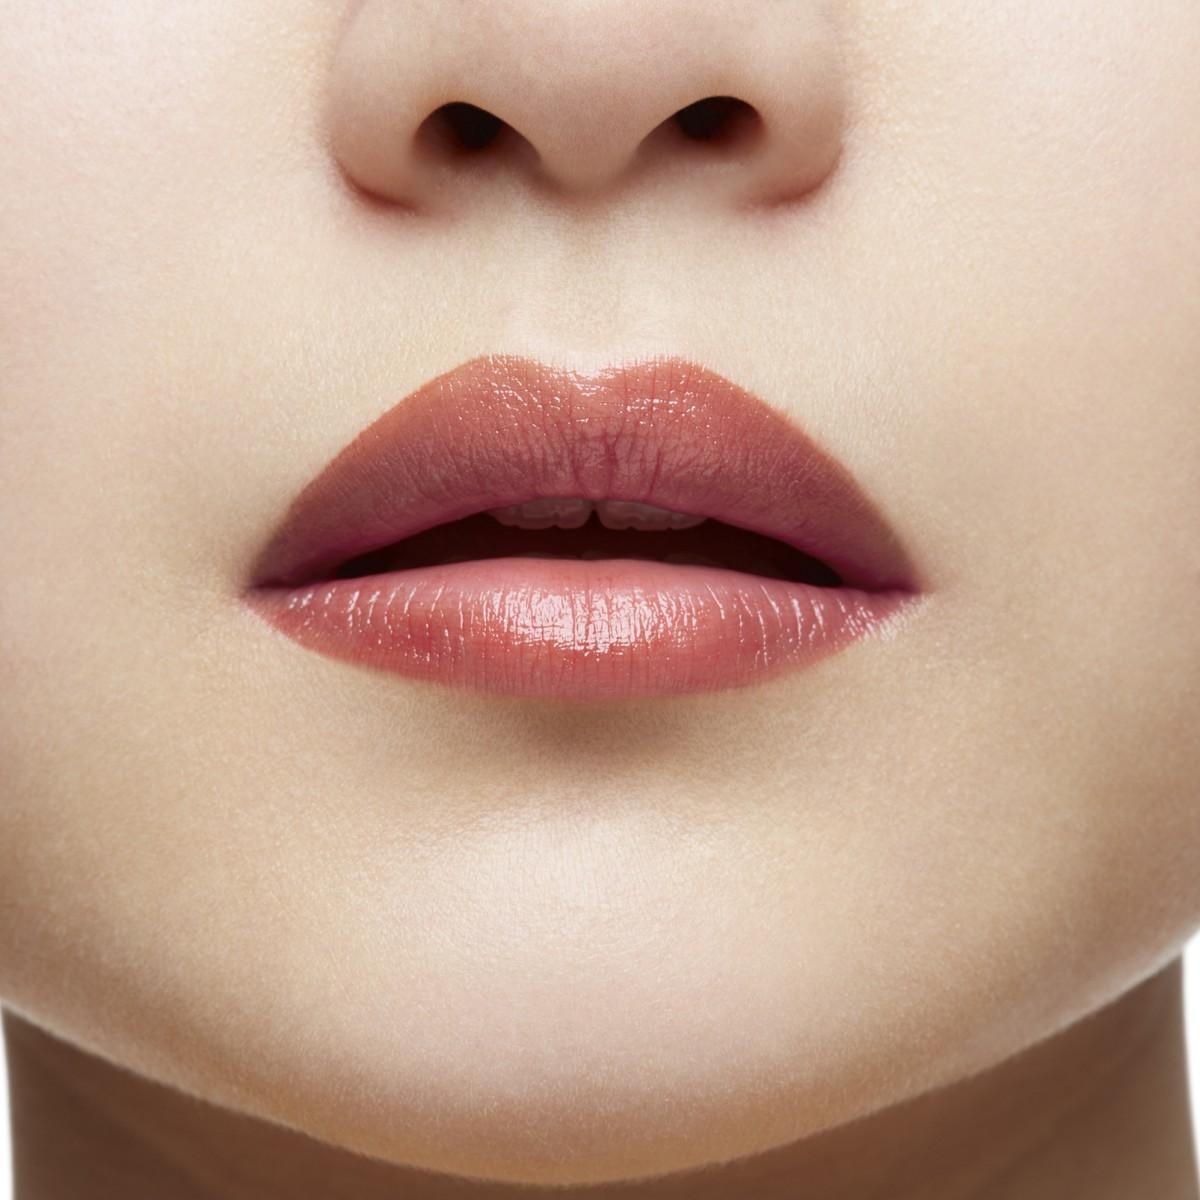 Beauty - Rose Du Désert - Christian Louboutin